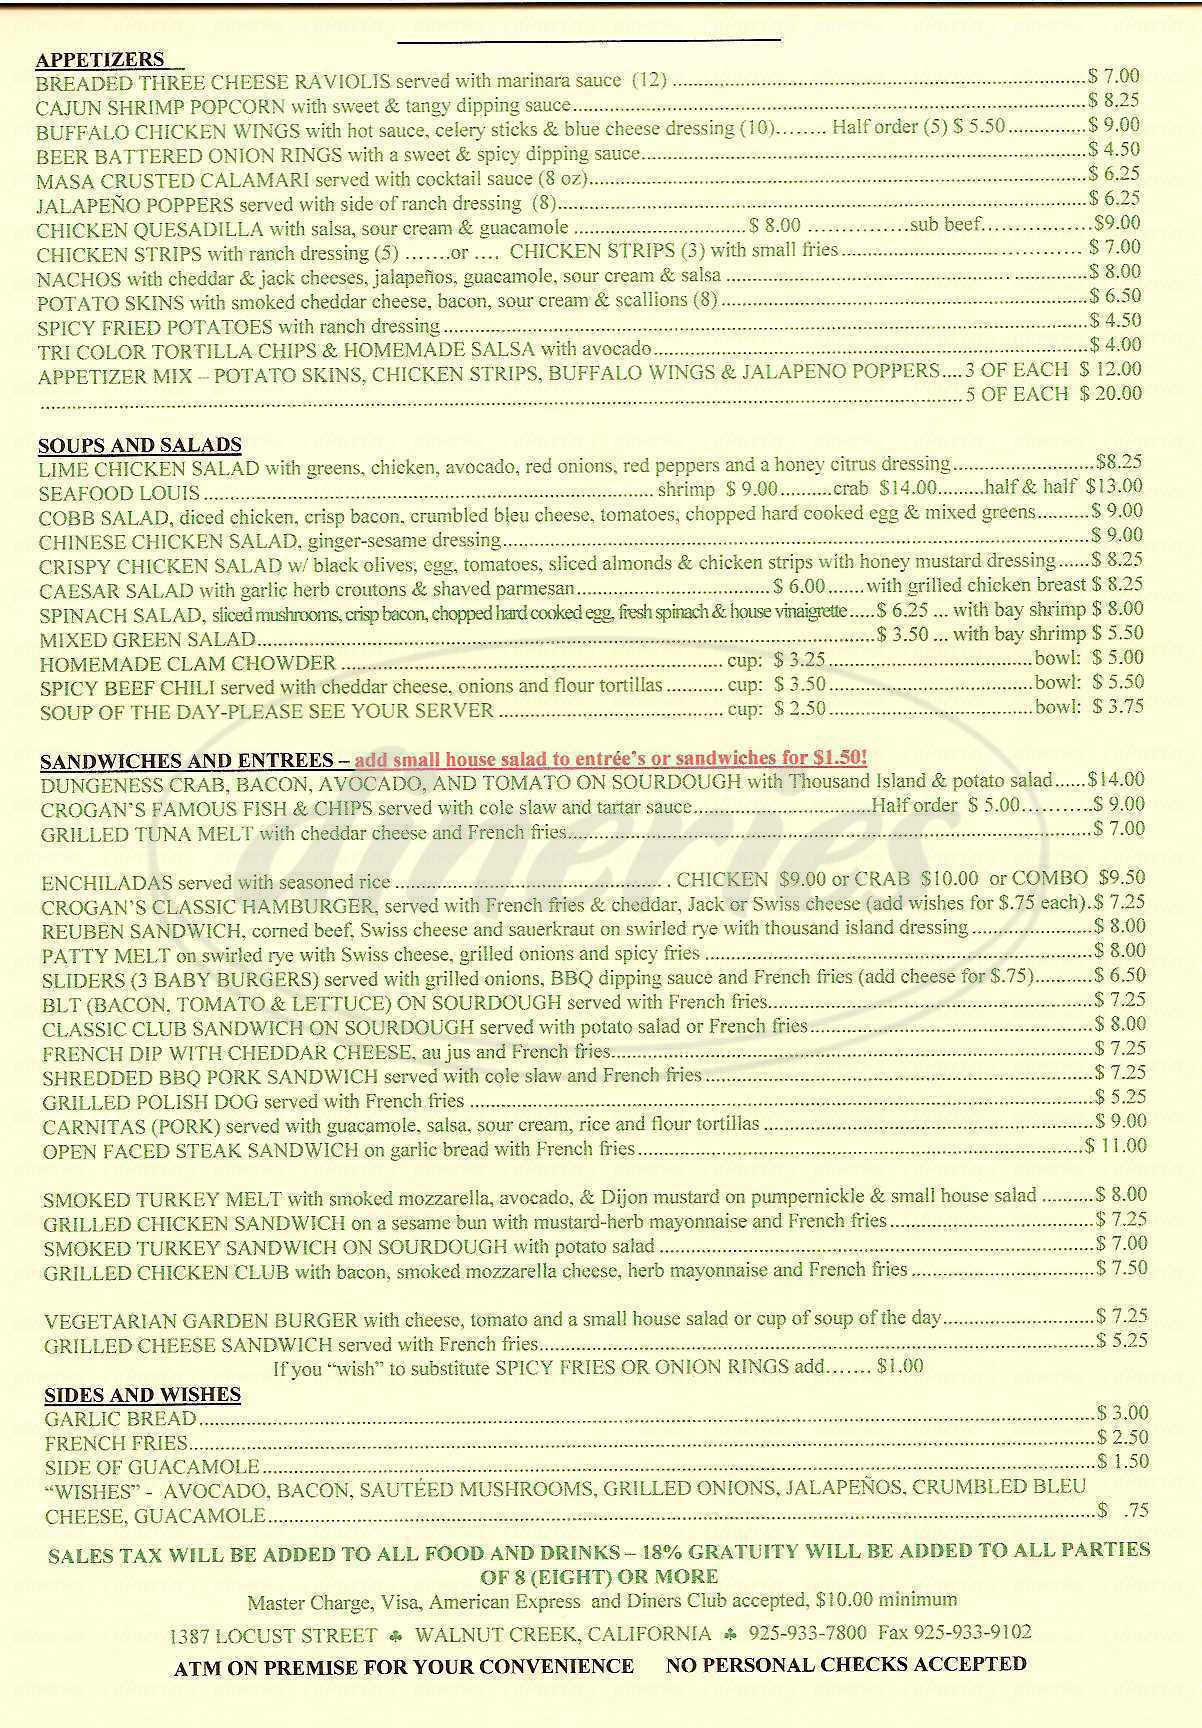 menu for Crogan's Bar & Grill